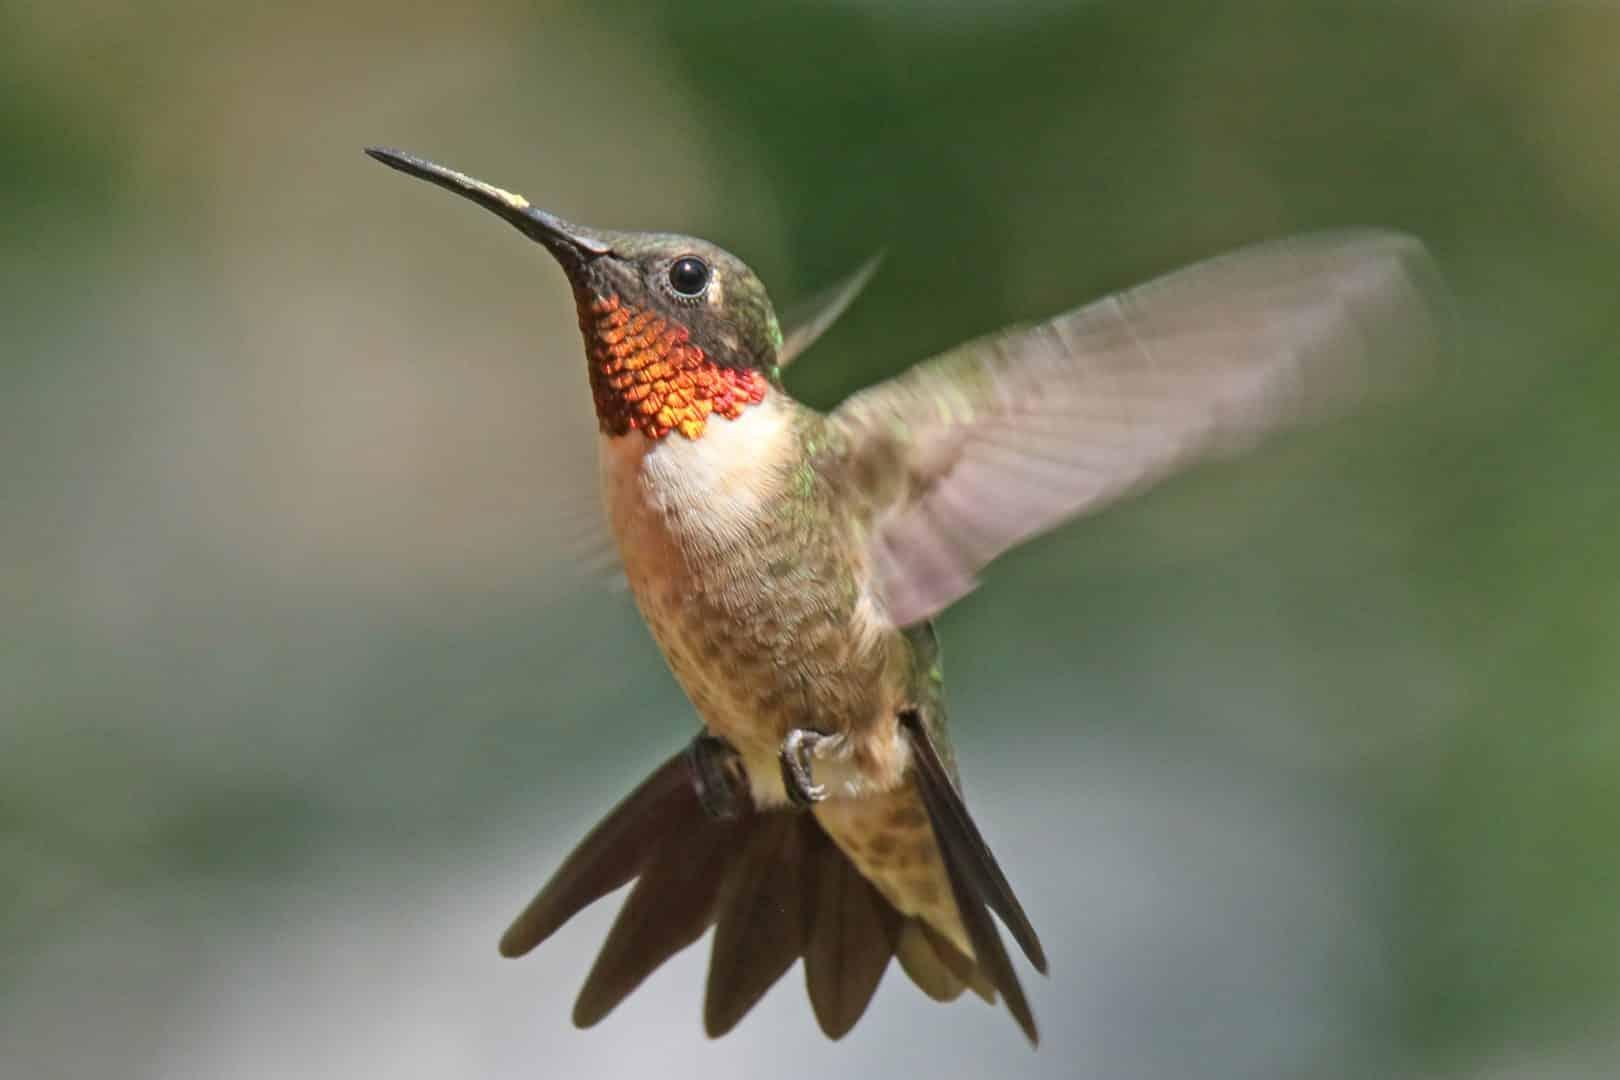 Beija-flor - Características e fatos sobre o menor pássaro do mundo